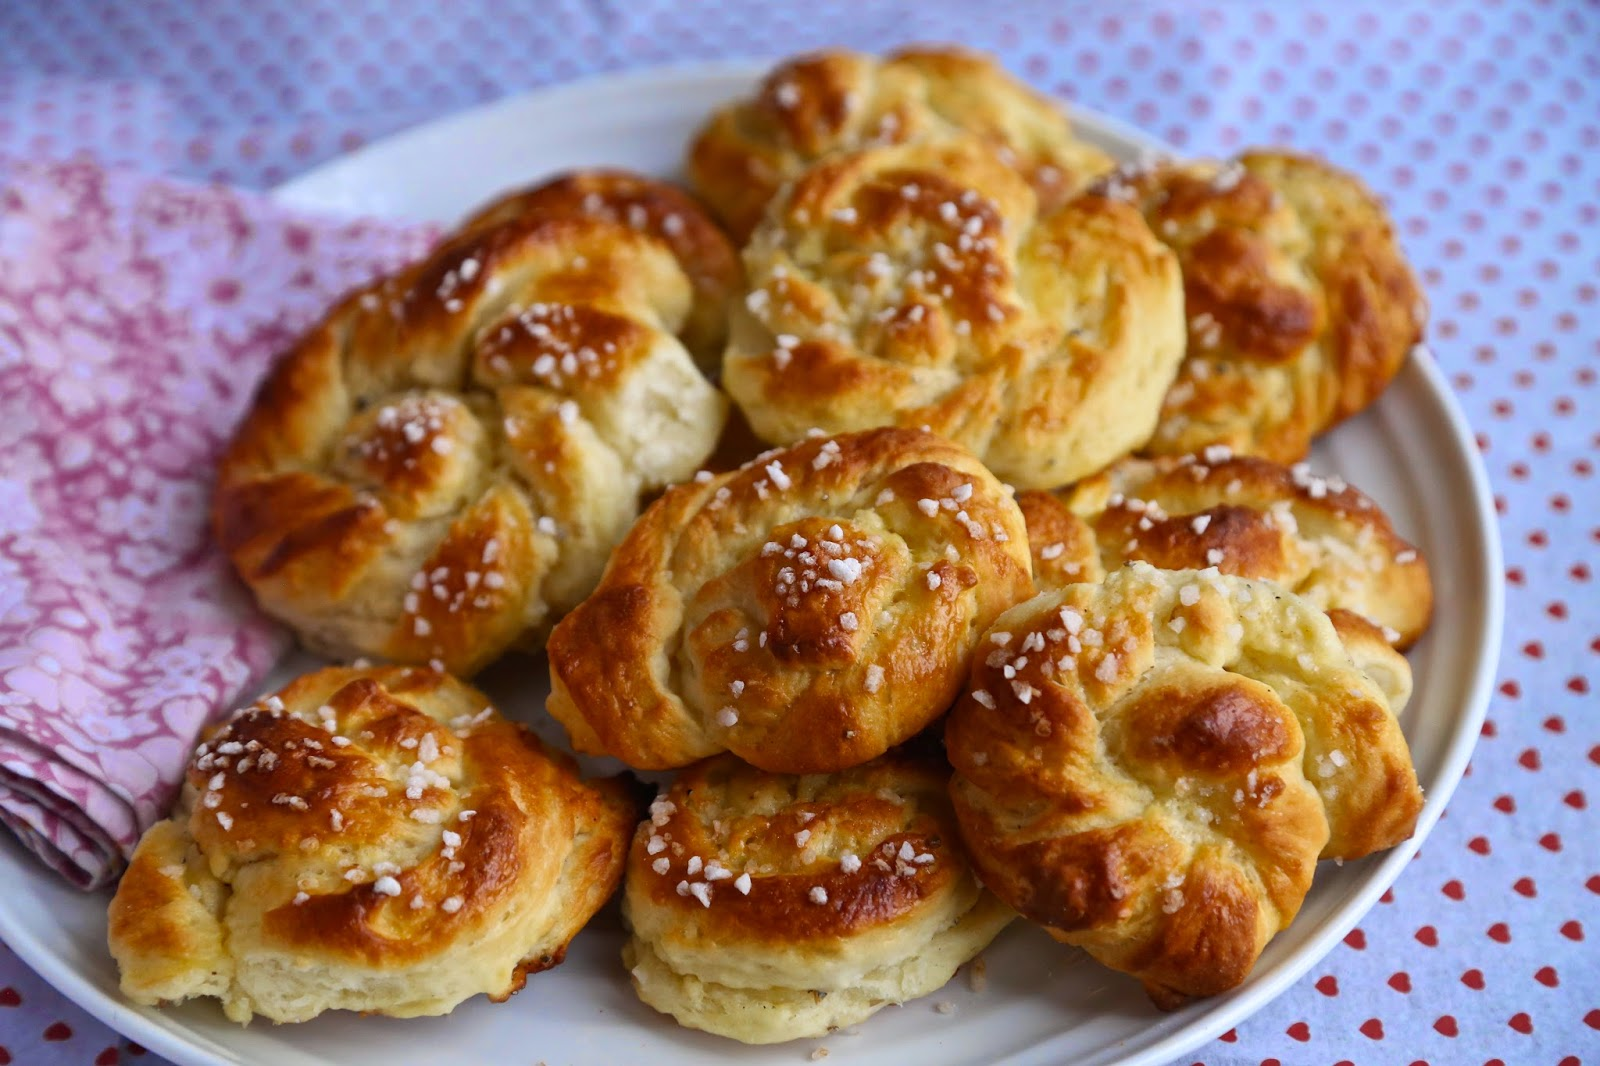 MsMarmiteLover: Swedish cardamom buns recipe for John Cleese